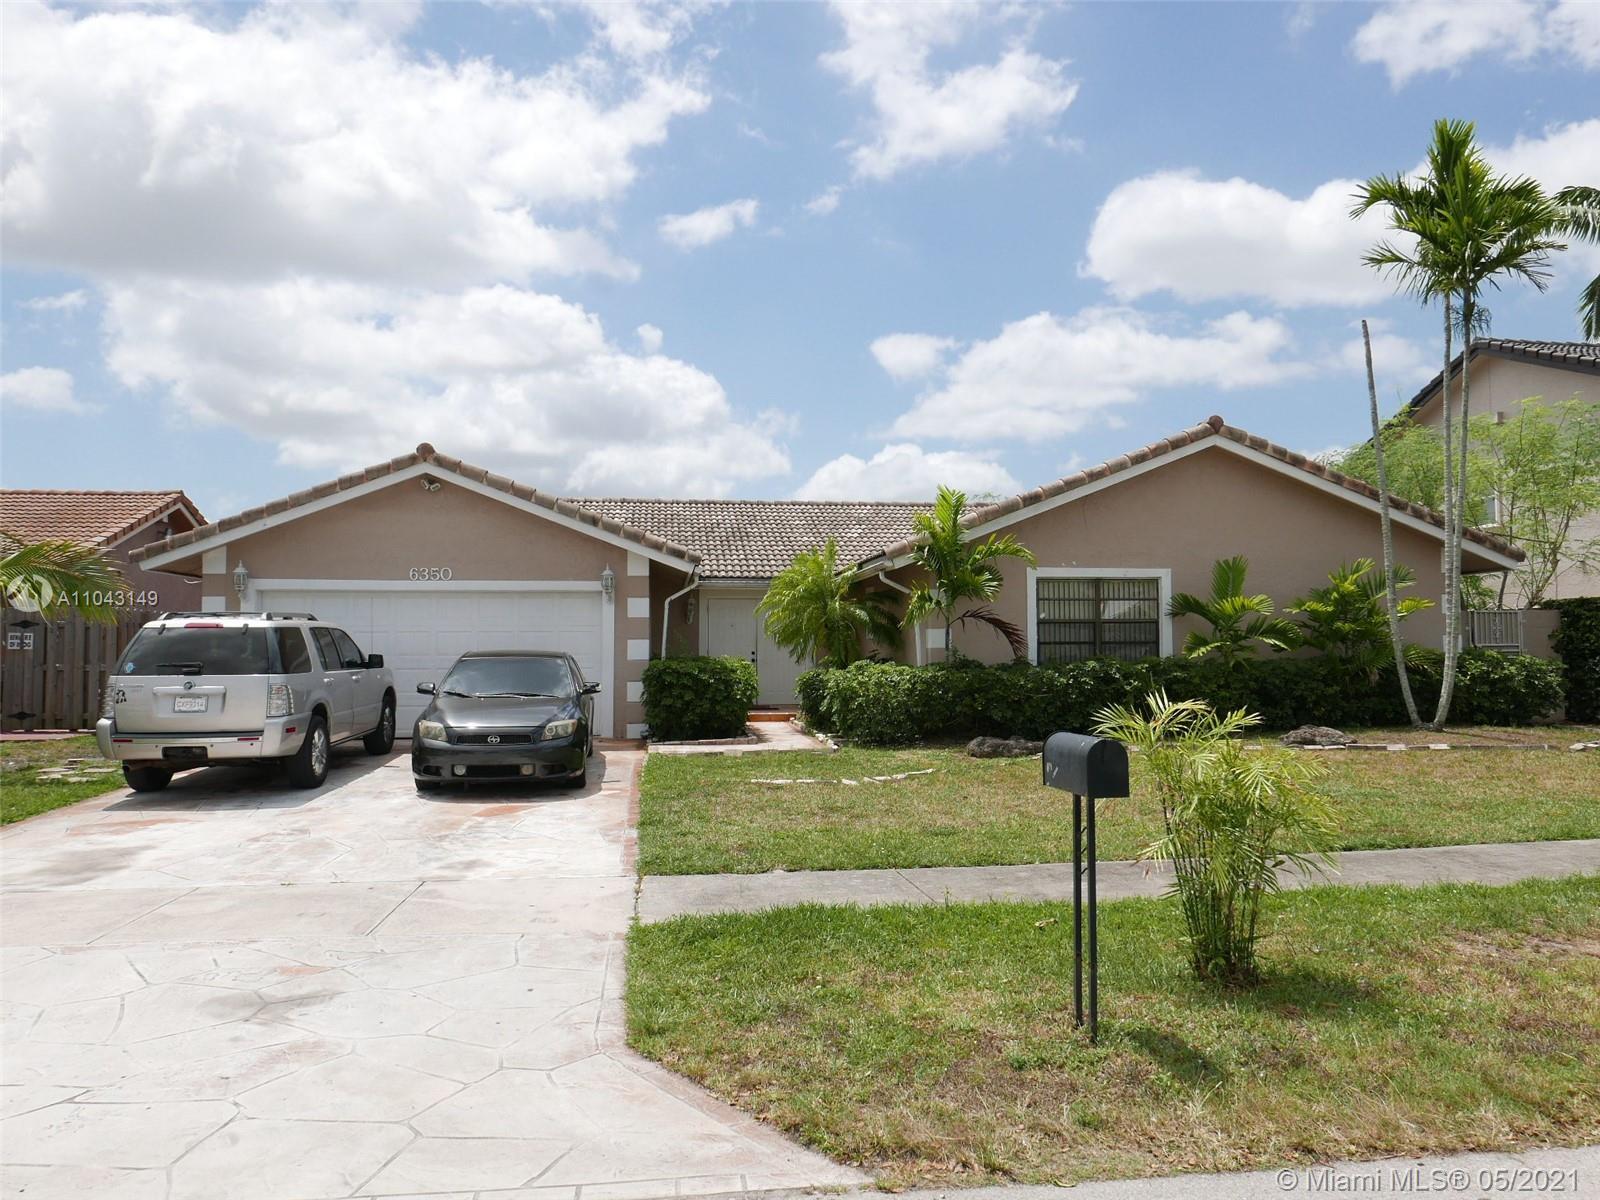 Country Lake Manor - 6350 NW 200th Ter, Hialeah, FL 33015